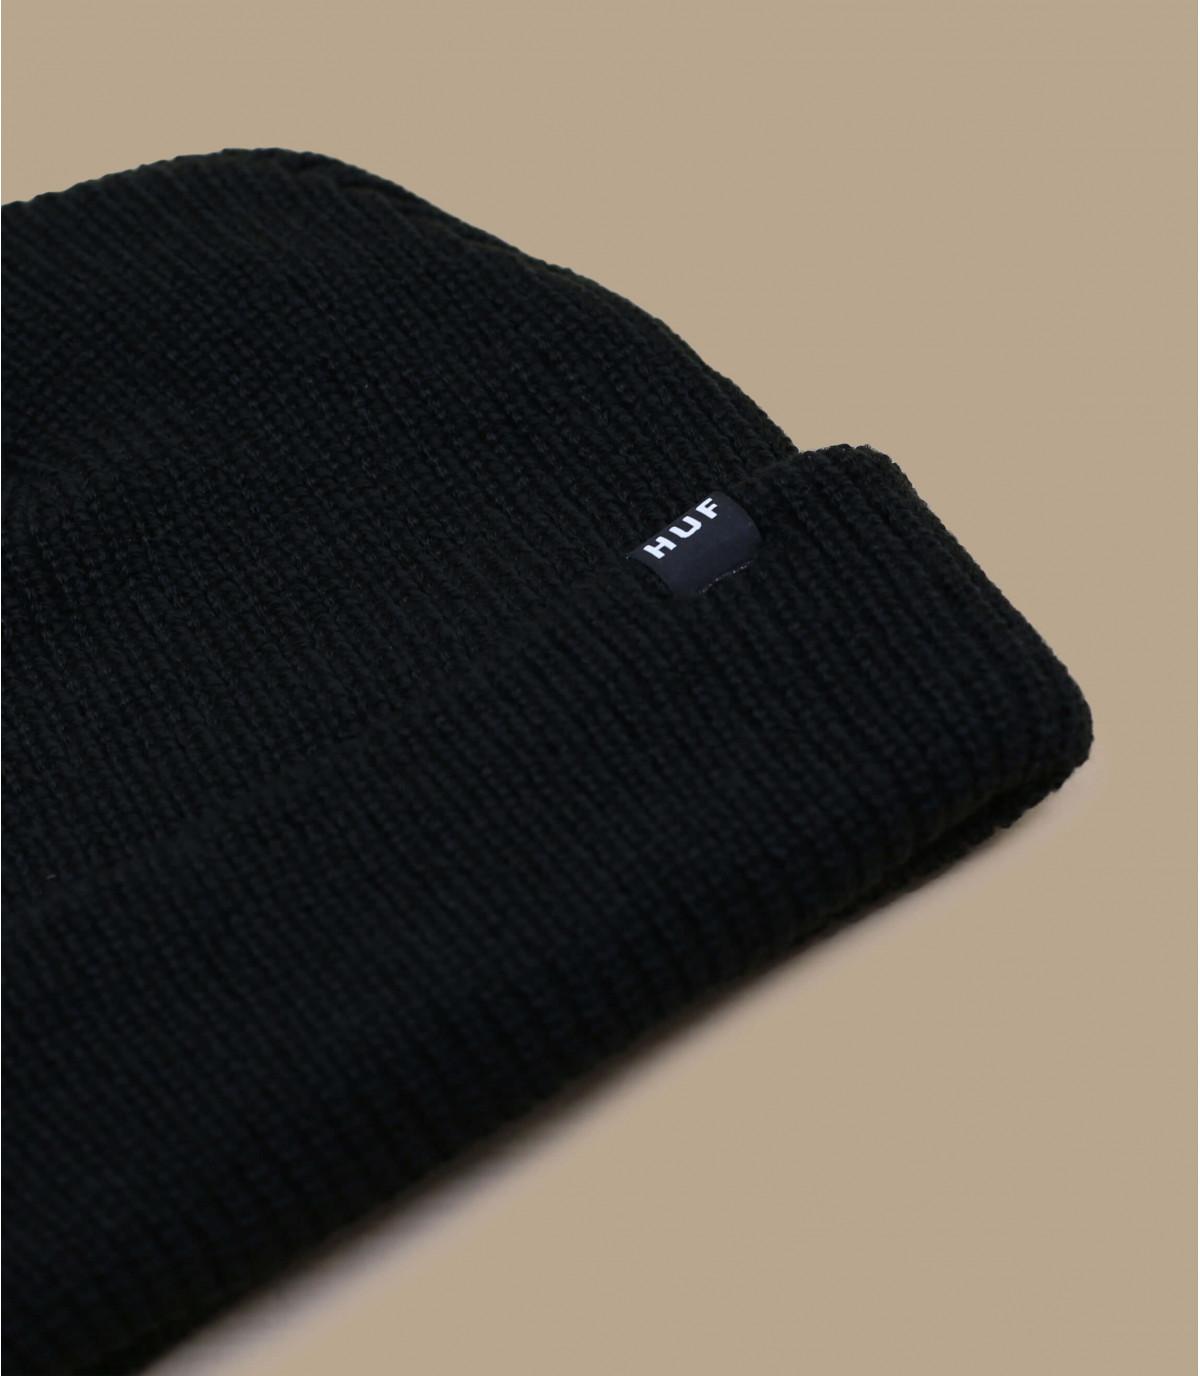 Black men beanie - Usual beanie black by Huf. Headict fec82700b08